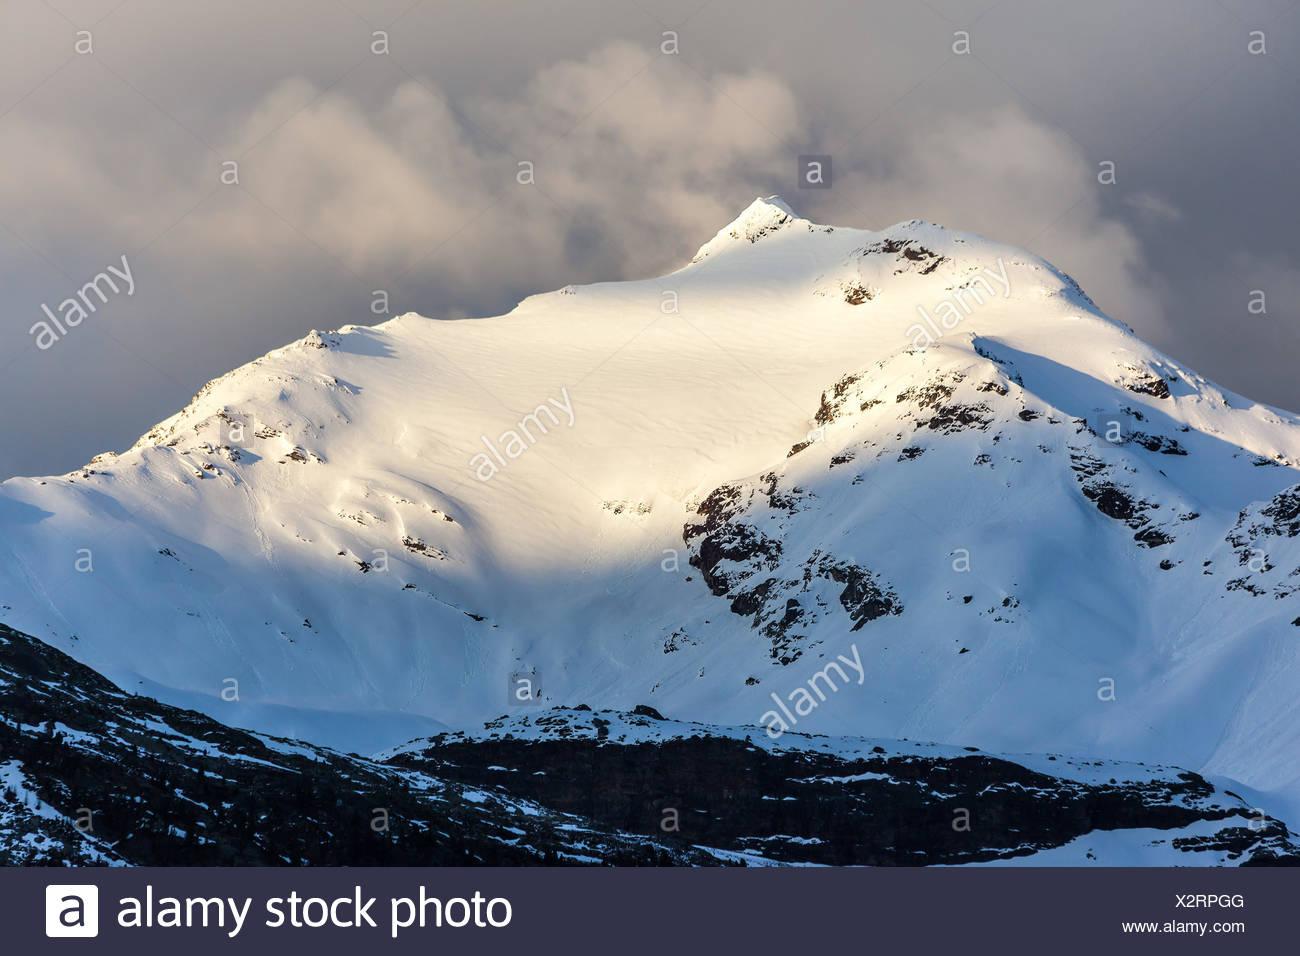 Schneebedeckte Berge im Reintal, Südtirol, Italien - Stock Image